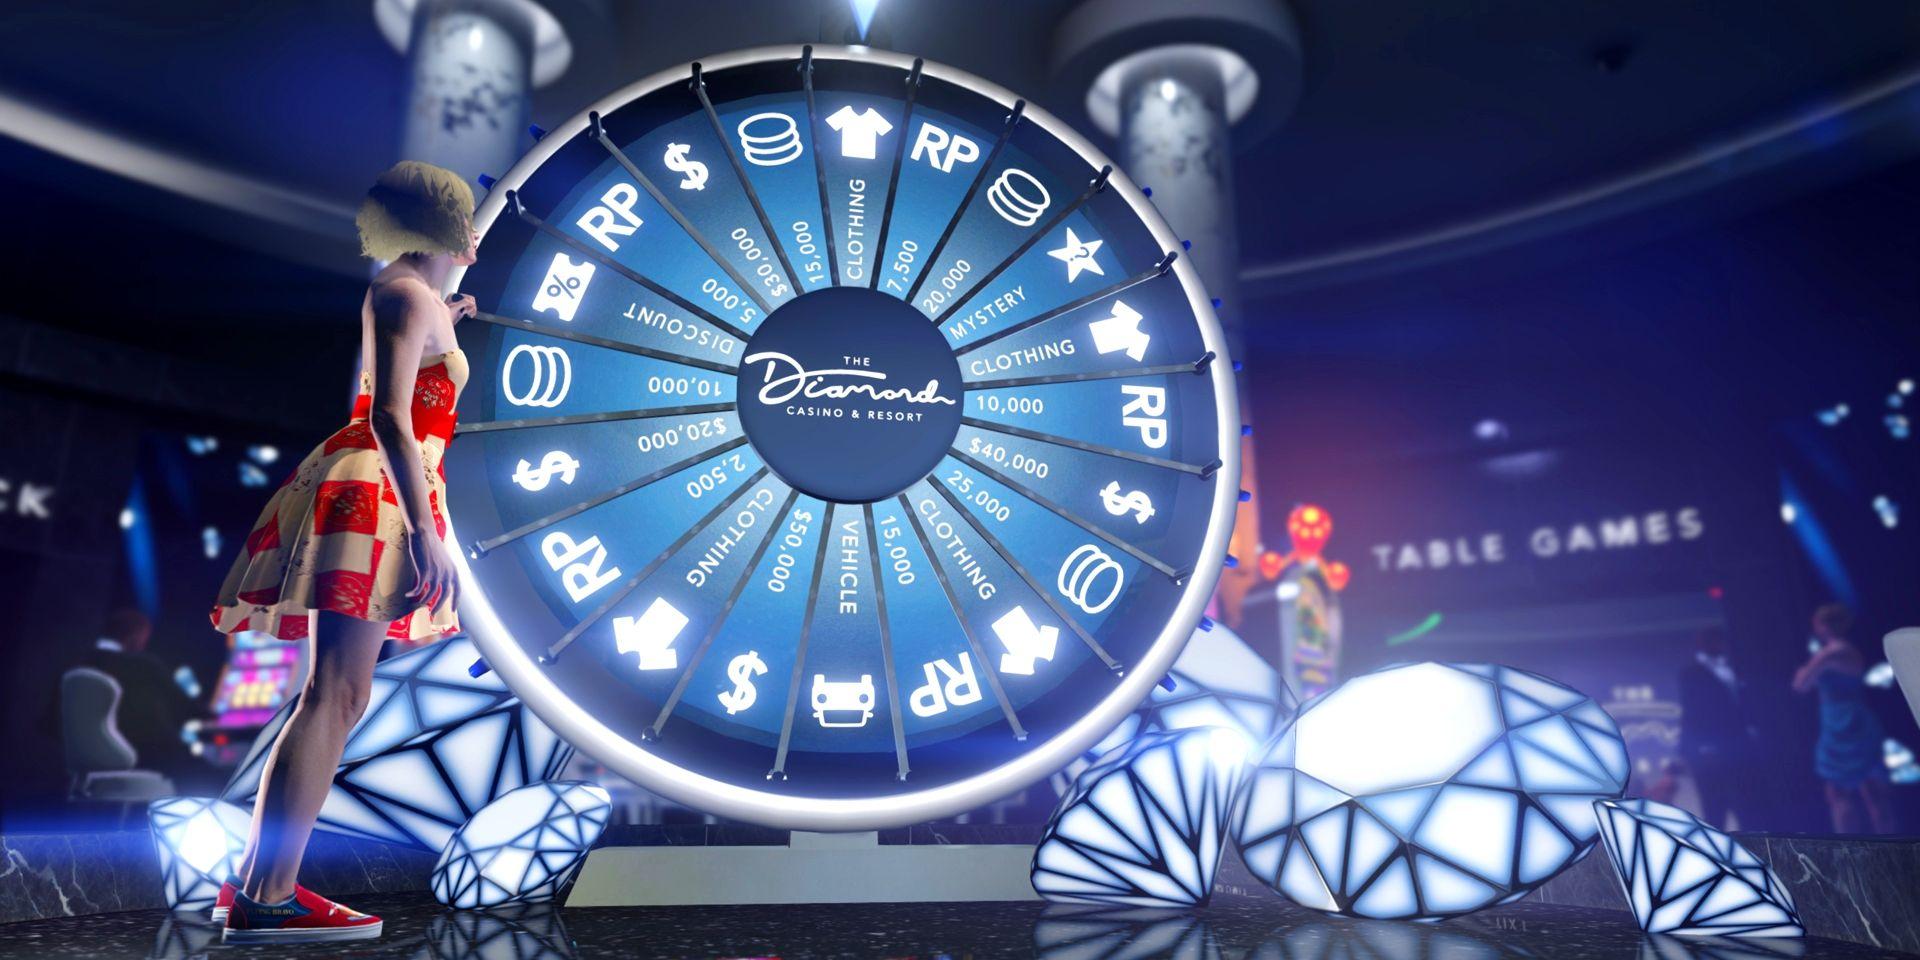 GTA Online Glitch Traps Players In The Casino | Screen Rant